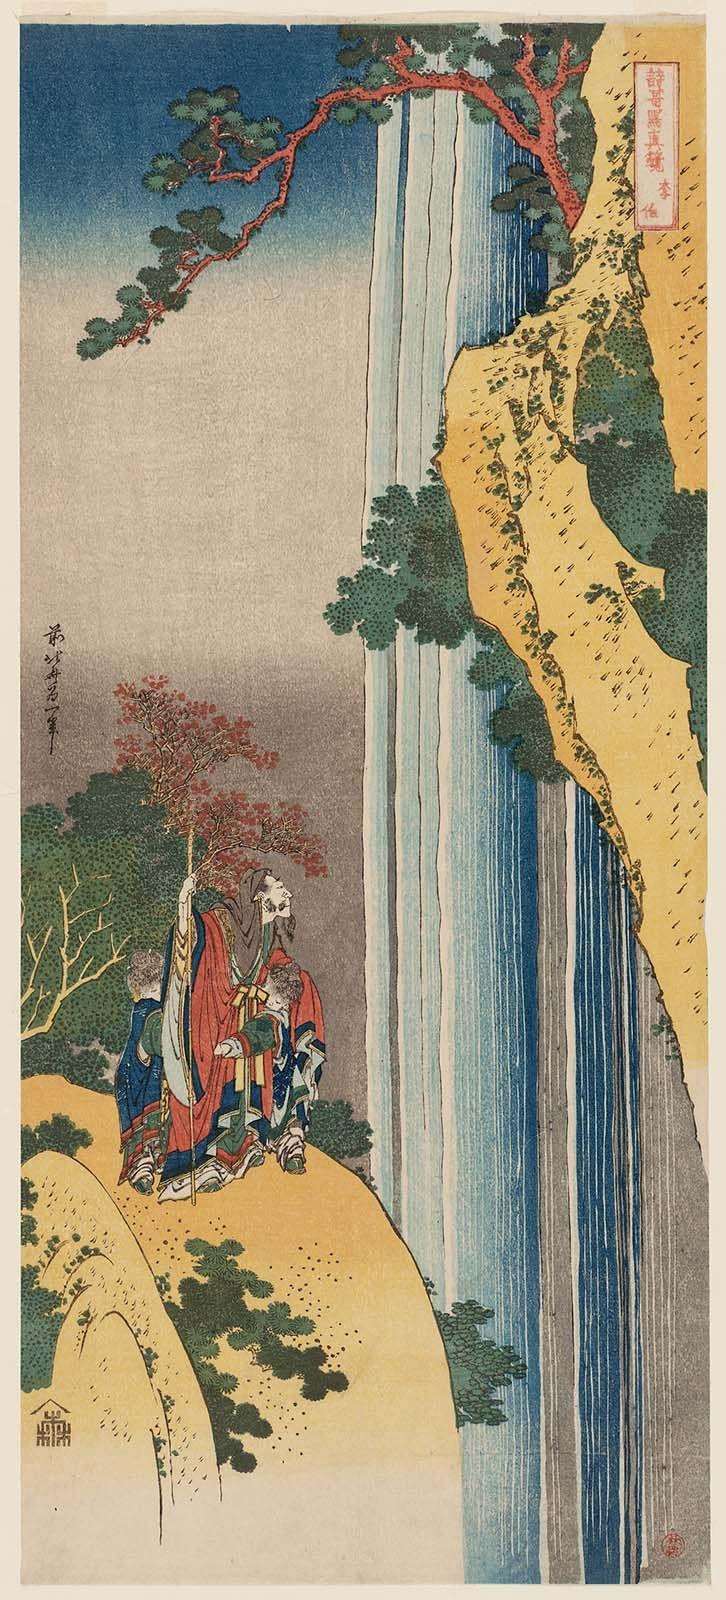 14 besten Katsushika Hokusai Bilder auf Pinterest   Holzschnitt ...